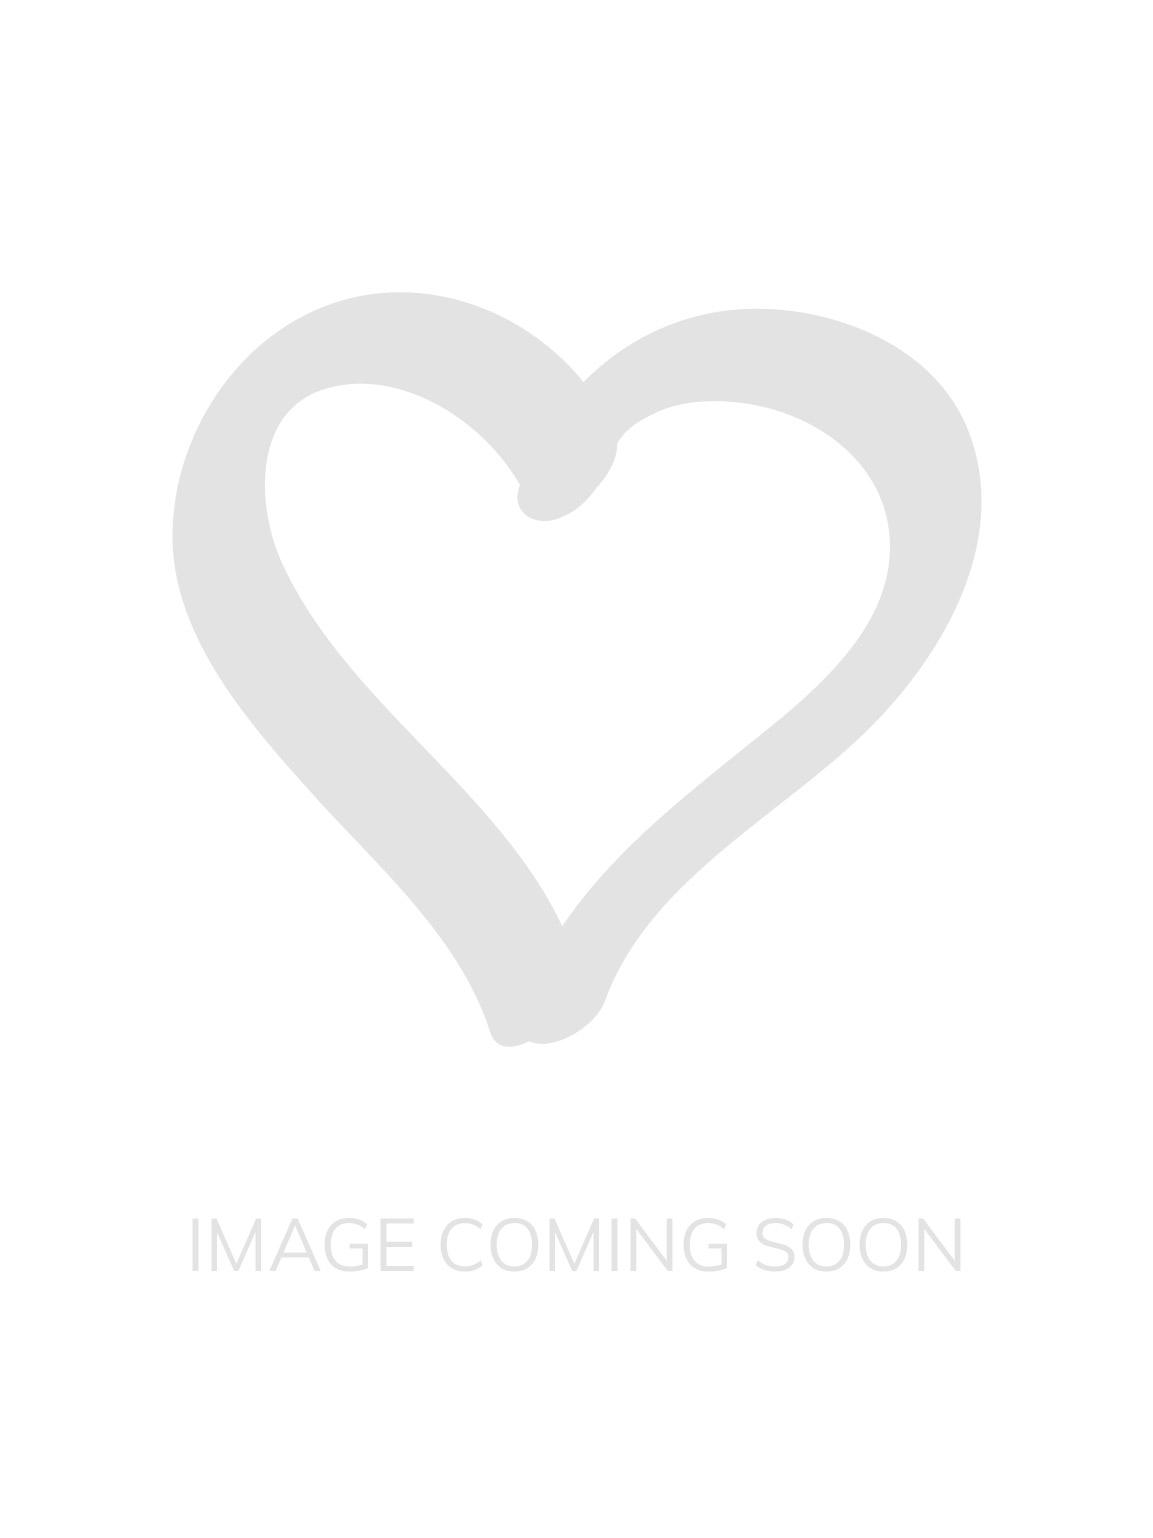 1ba92153c6f31 Flower Elegance Full Cup Bra - Chilli Red